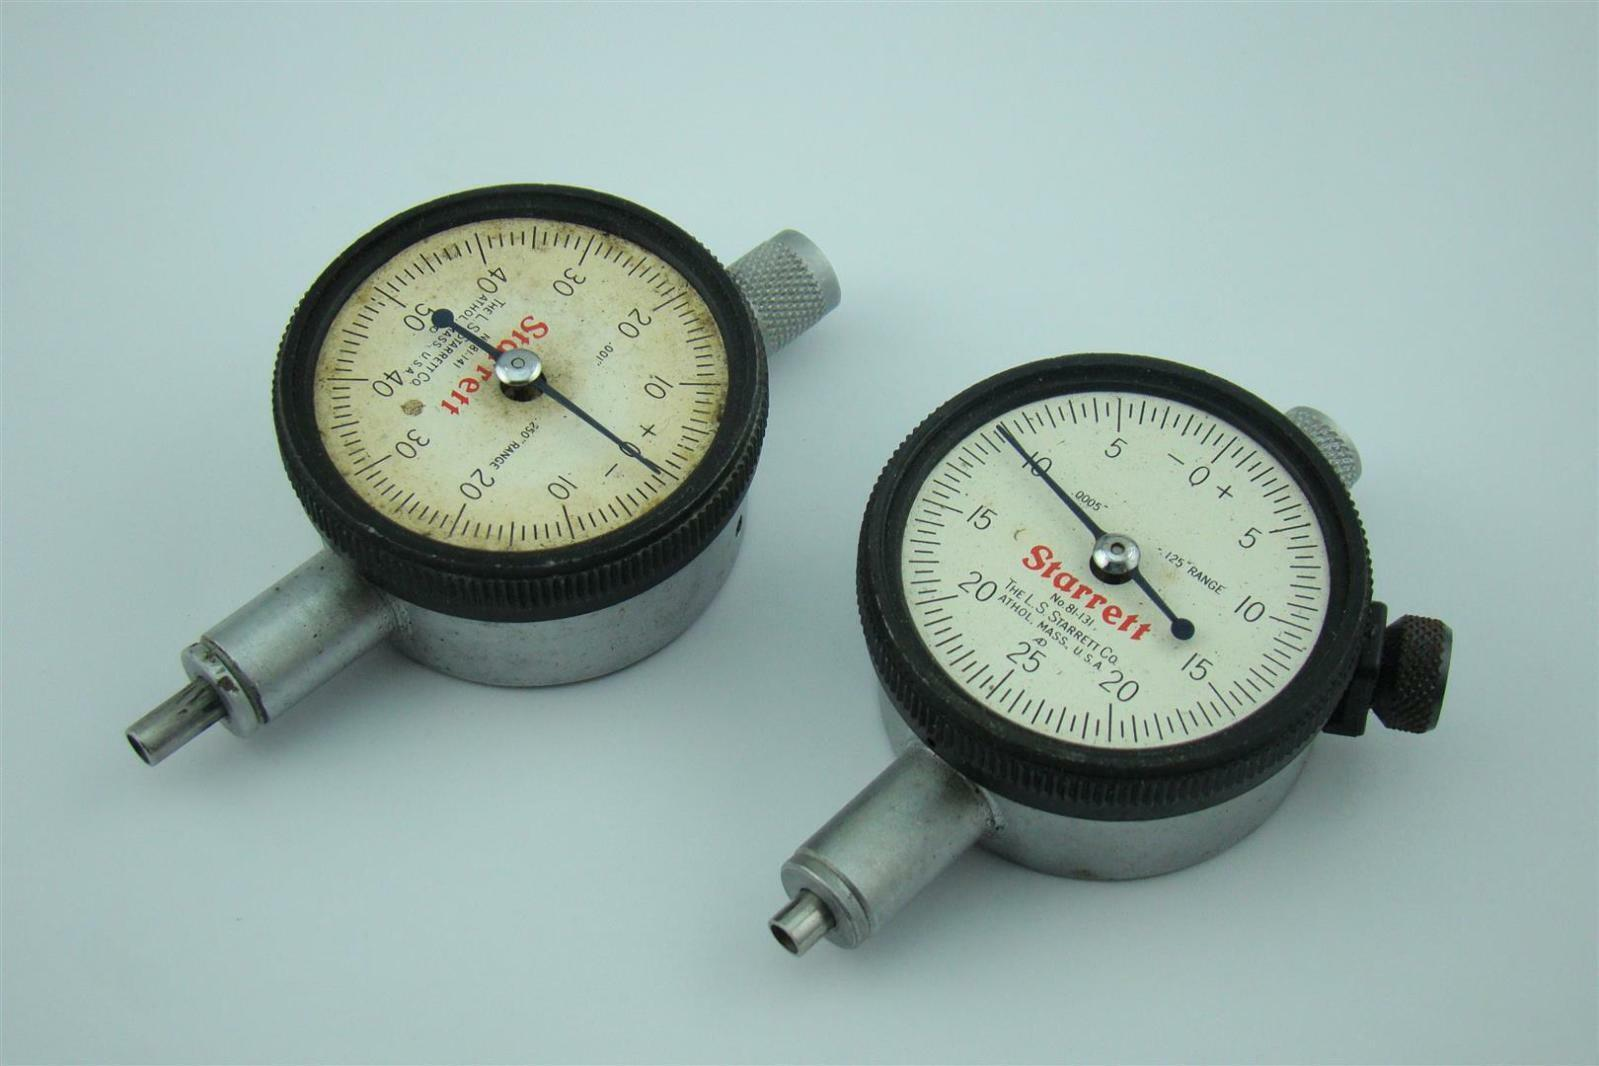 Starrett Dial Indicator >> 2 Starrett Dial Indicator Gauge 81 131 Joseph Fazzio Incorporated